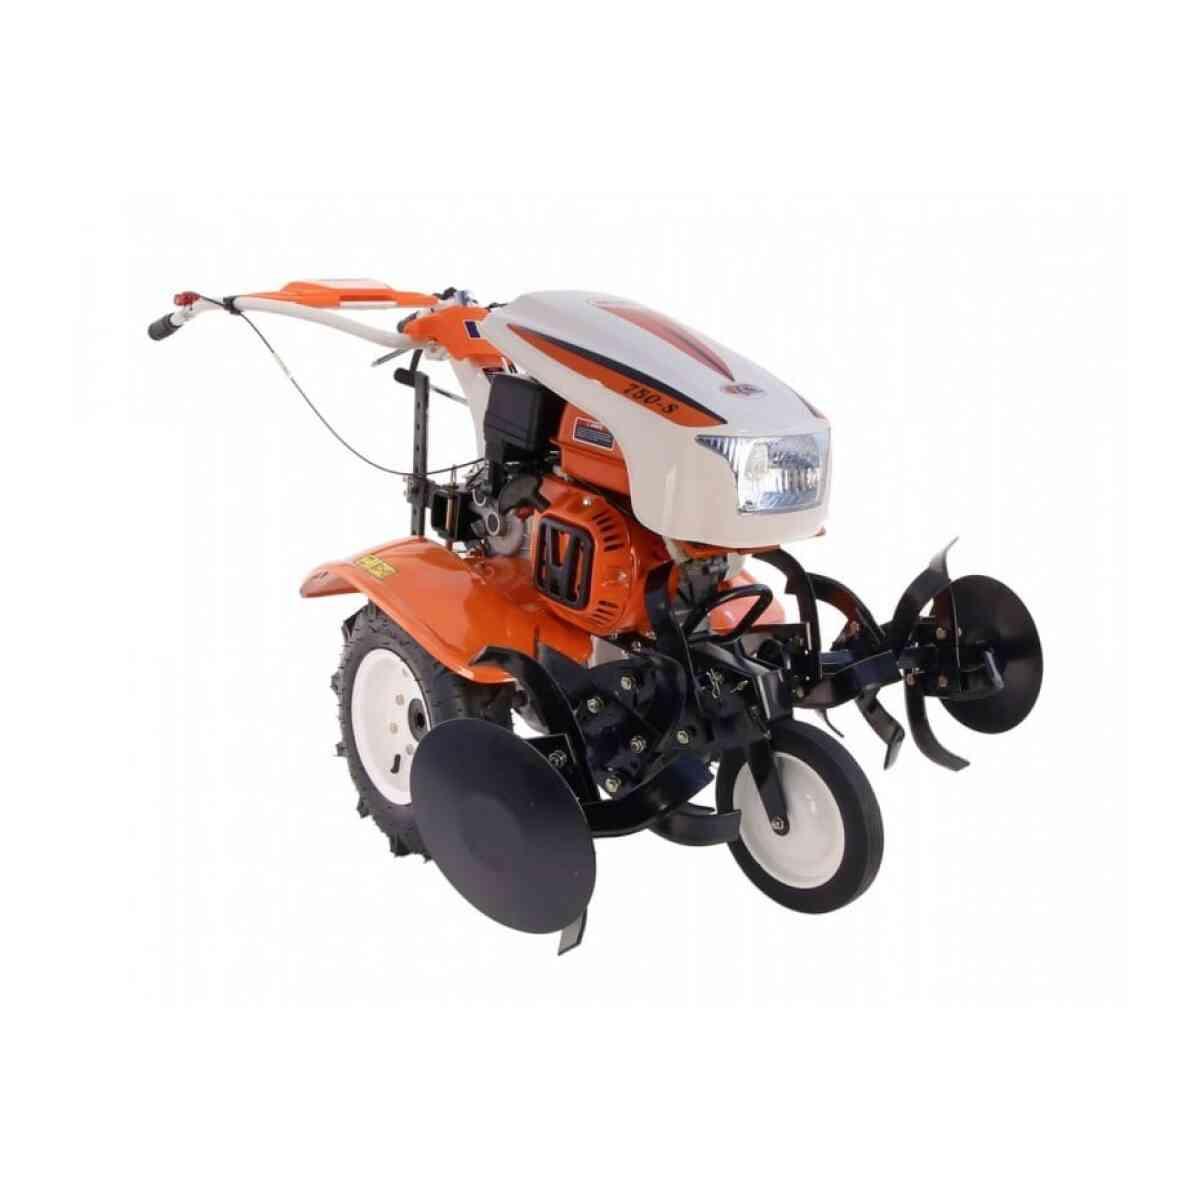 motocultor o mac 750s o mac.ro 1 1 66